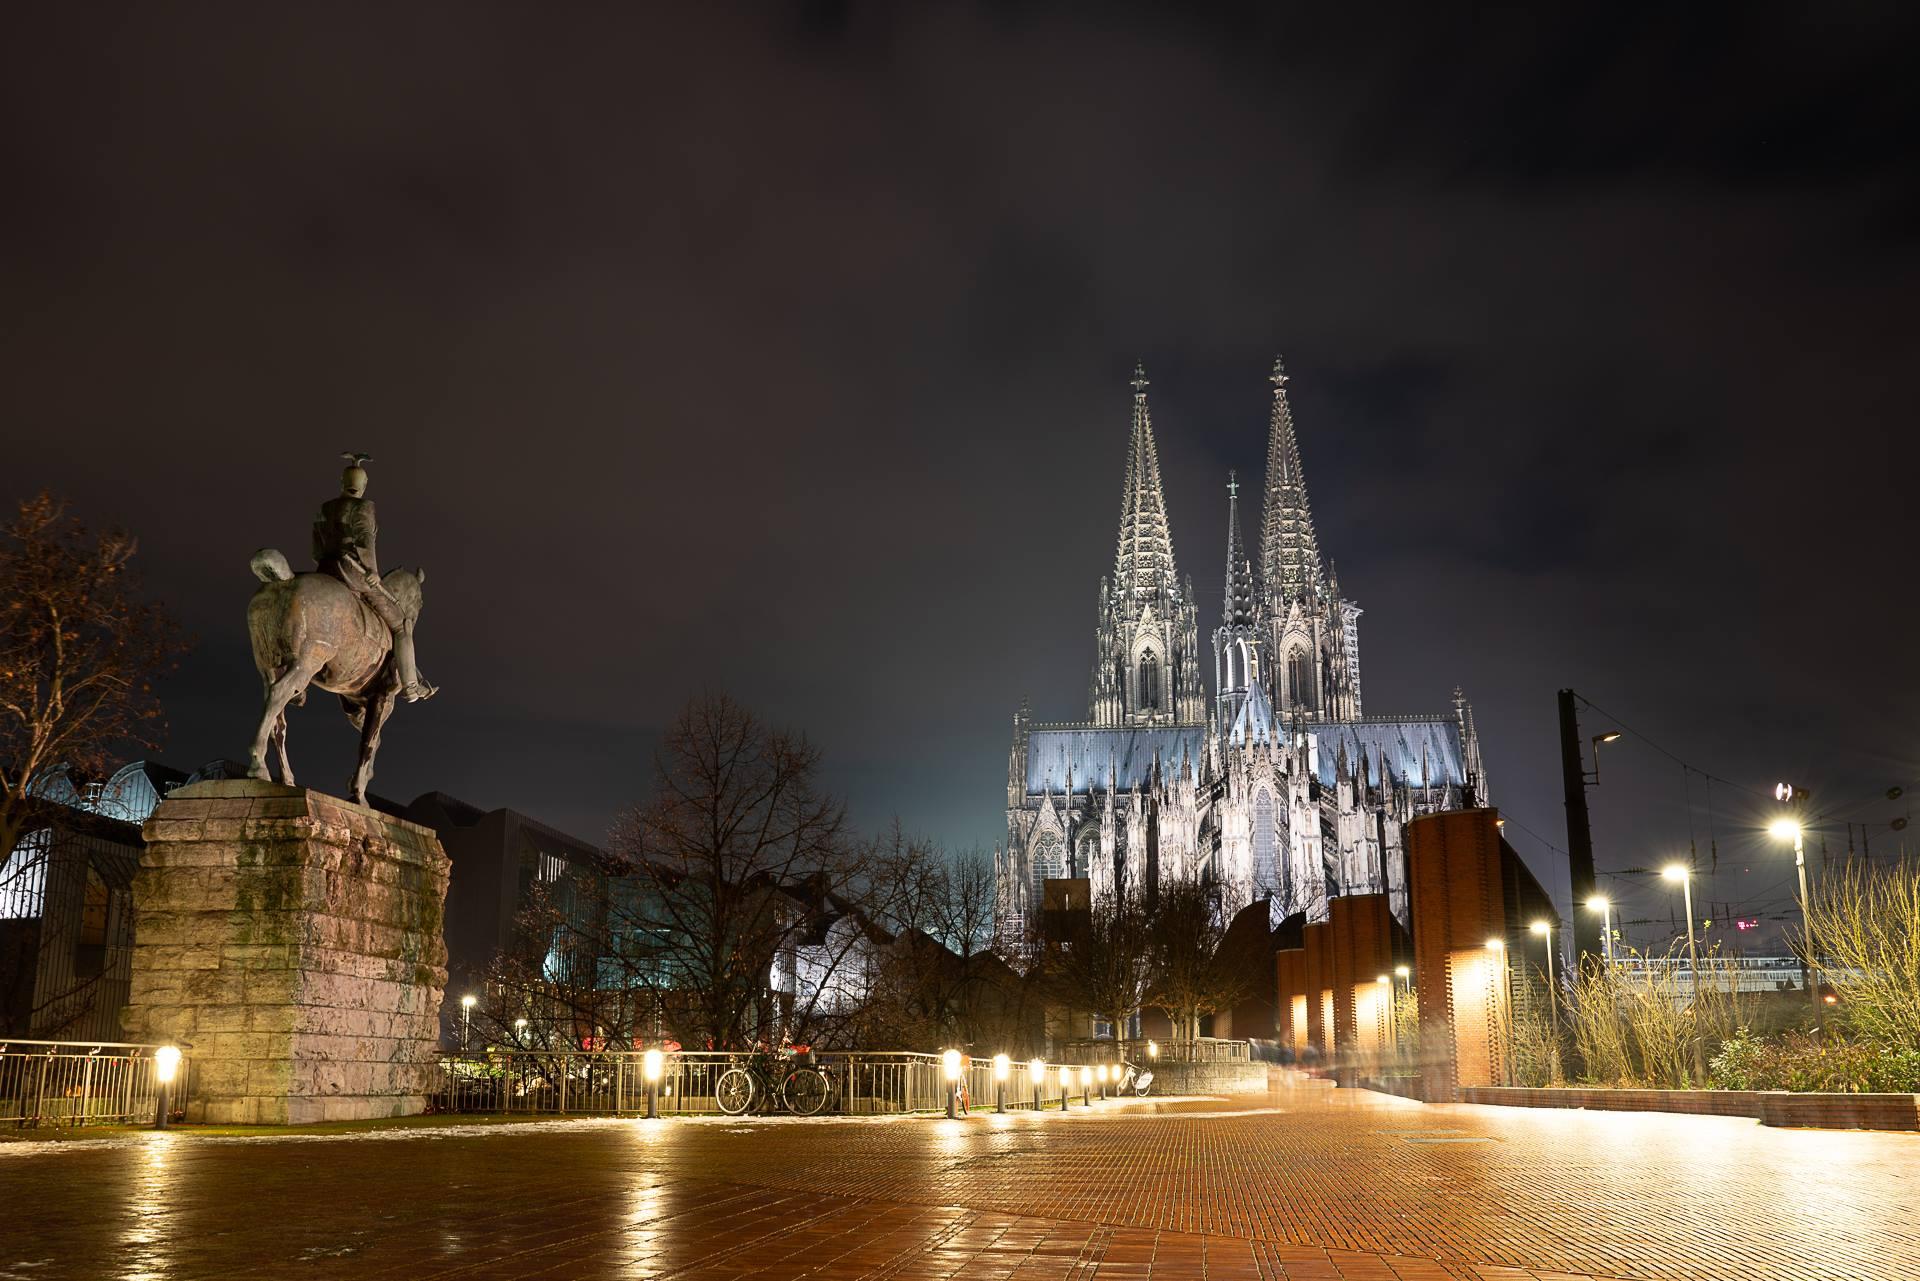 Thomas Löhmer Photowalk Nachtfotografie Köln